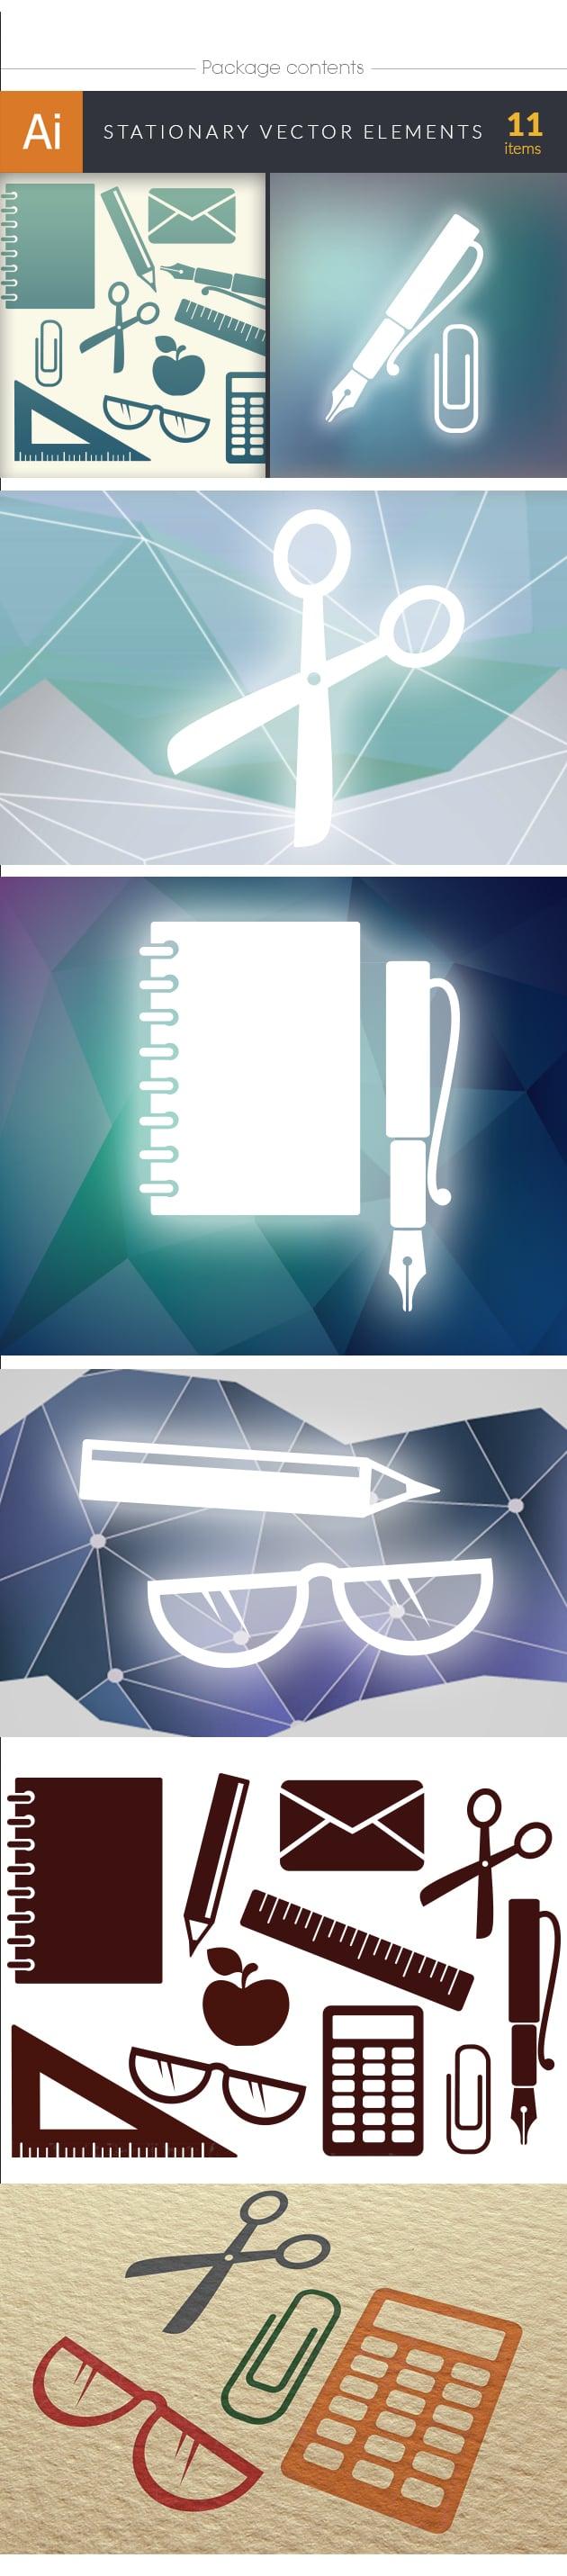 designtnt-stationary vector elements set 1-vector